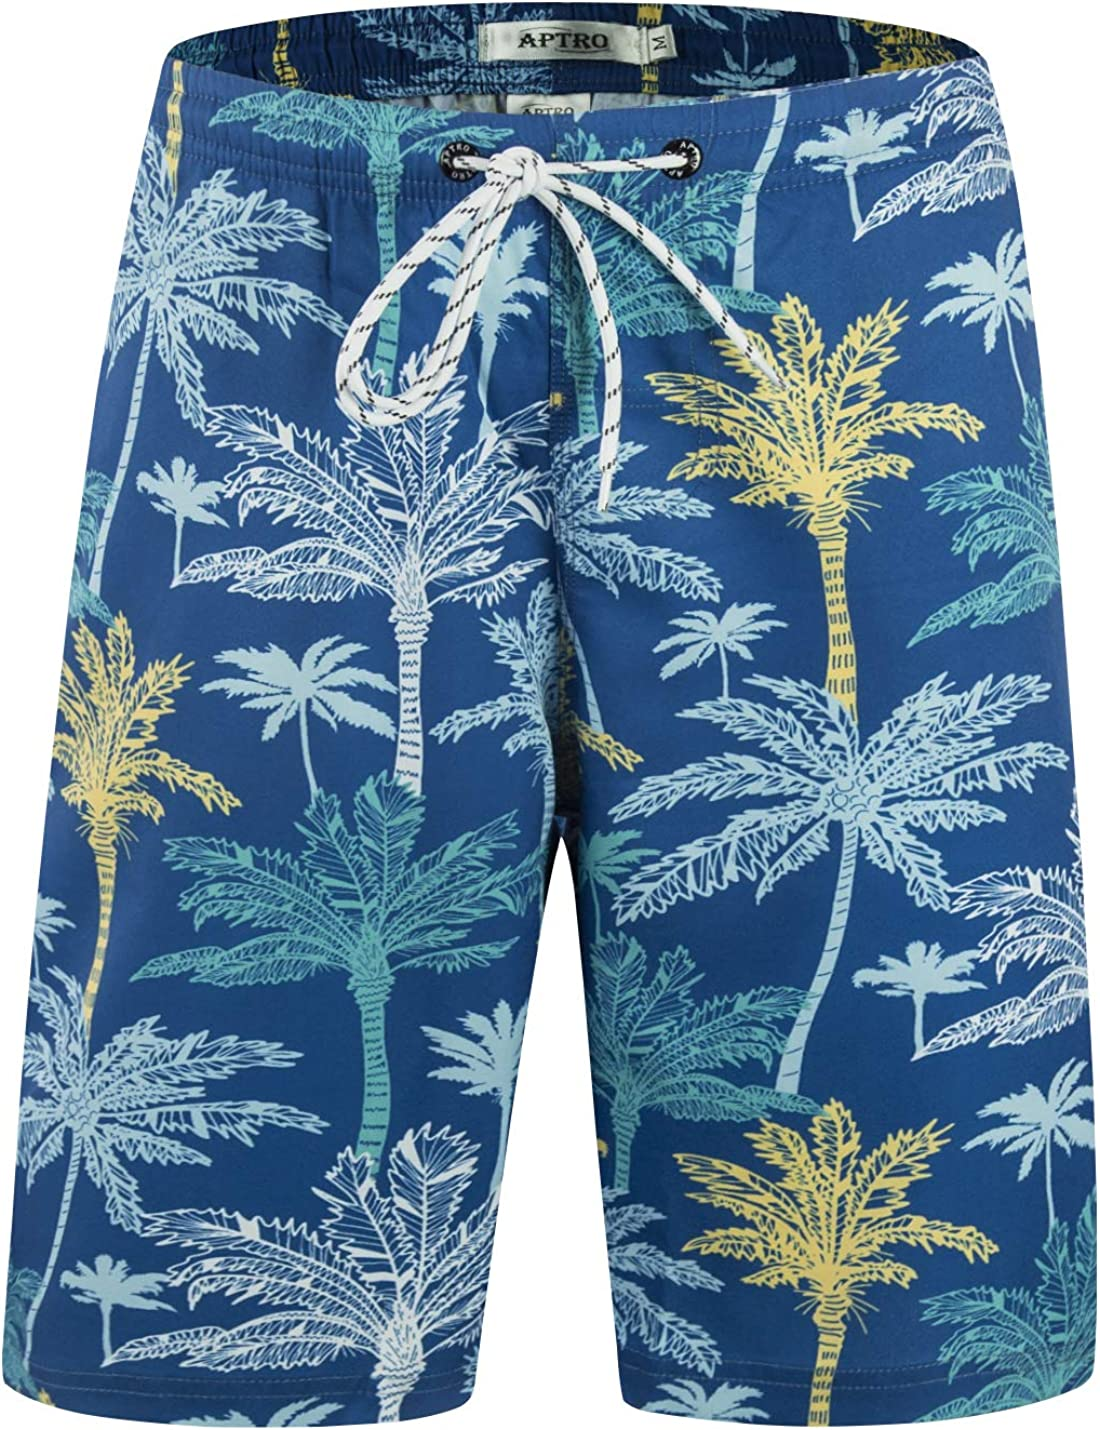 APTRO Mens Shorts Swim Trunks Quick Dry Shorts Knee Length Surf Beach Shorts Swim Wear Casual Hawaiian Elastic Side Shorts 02